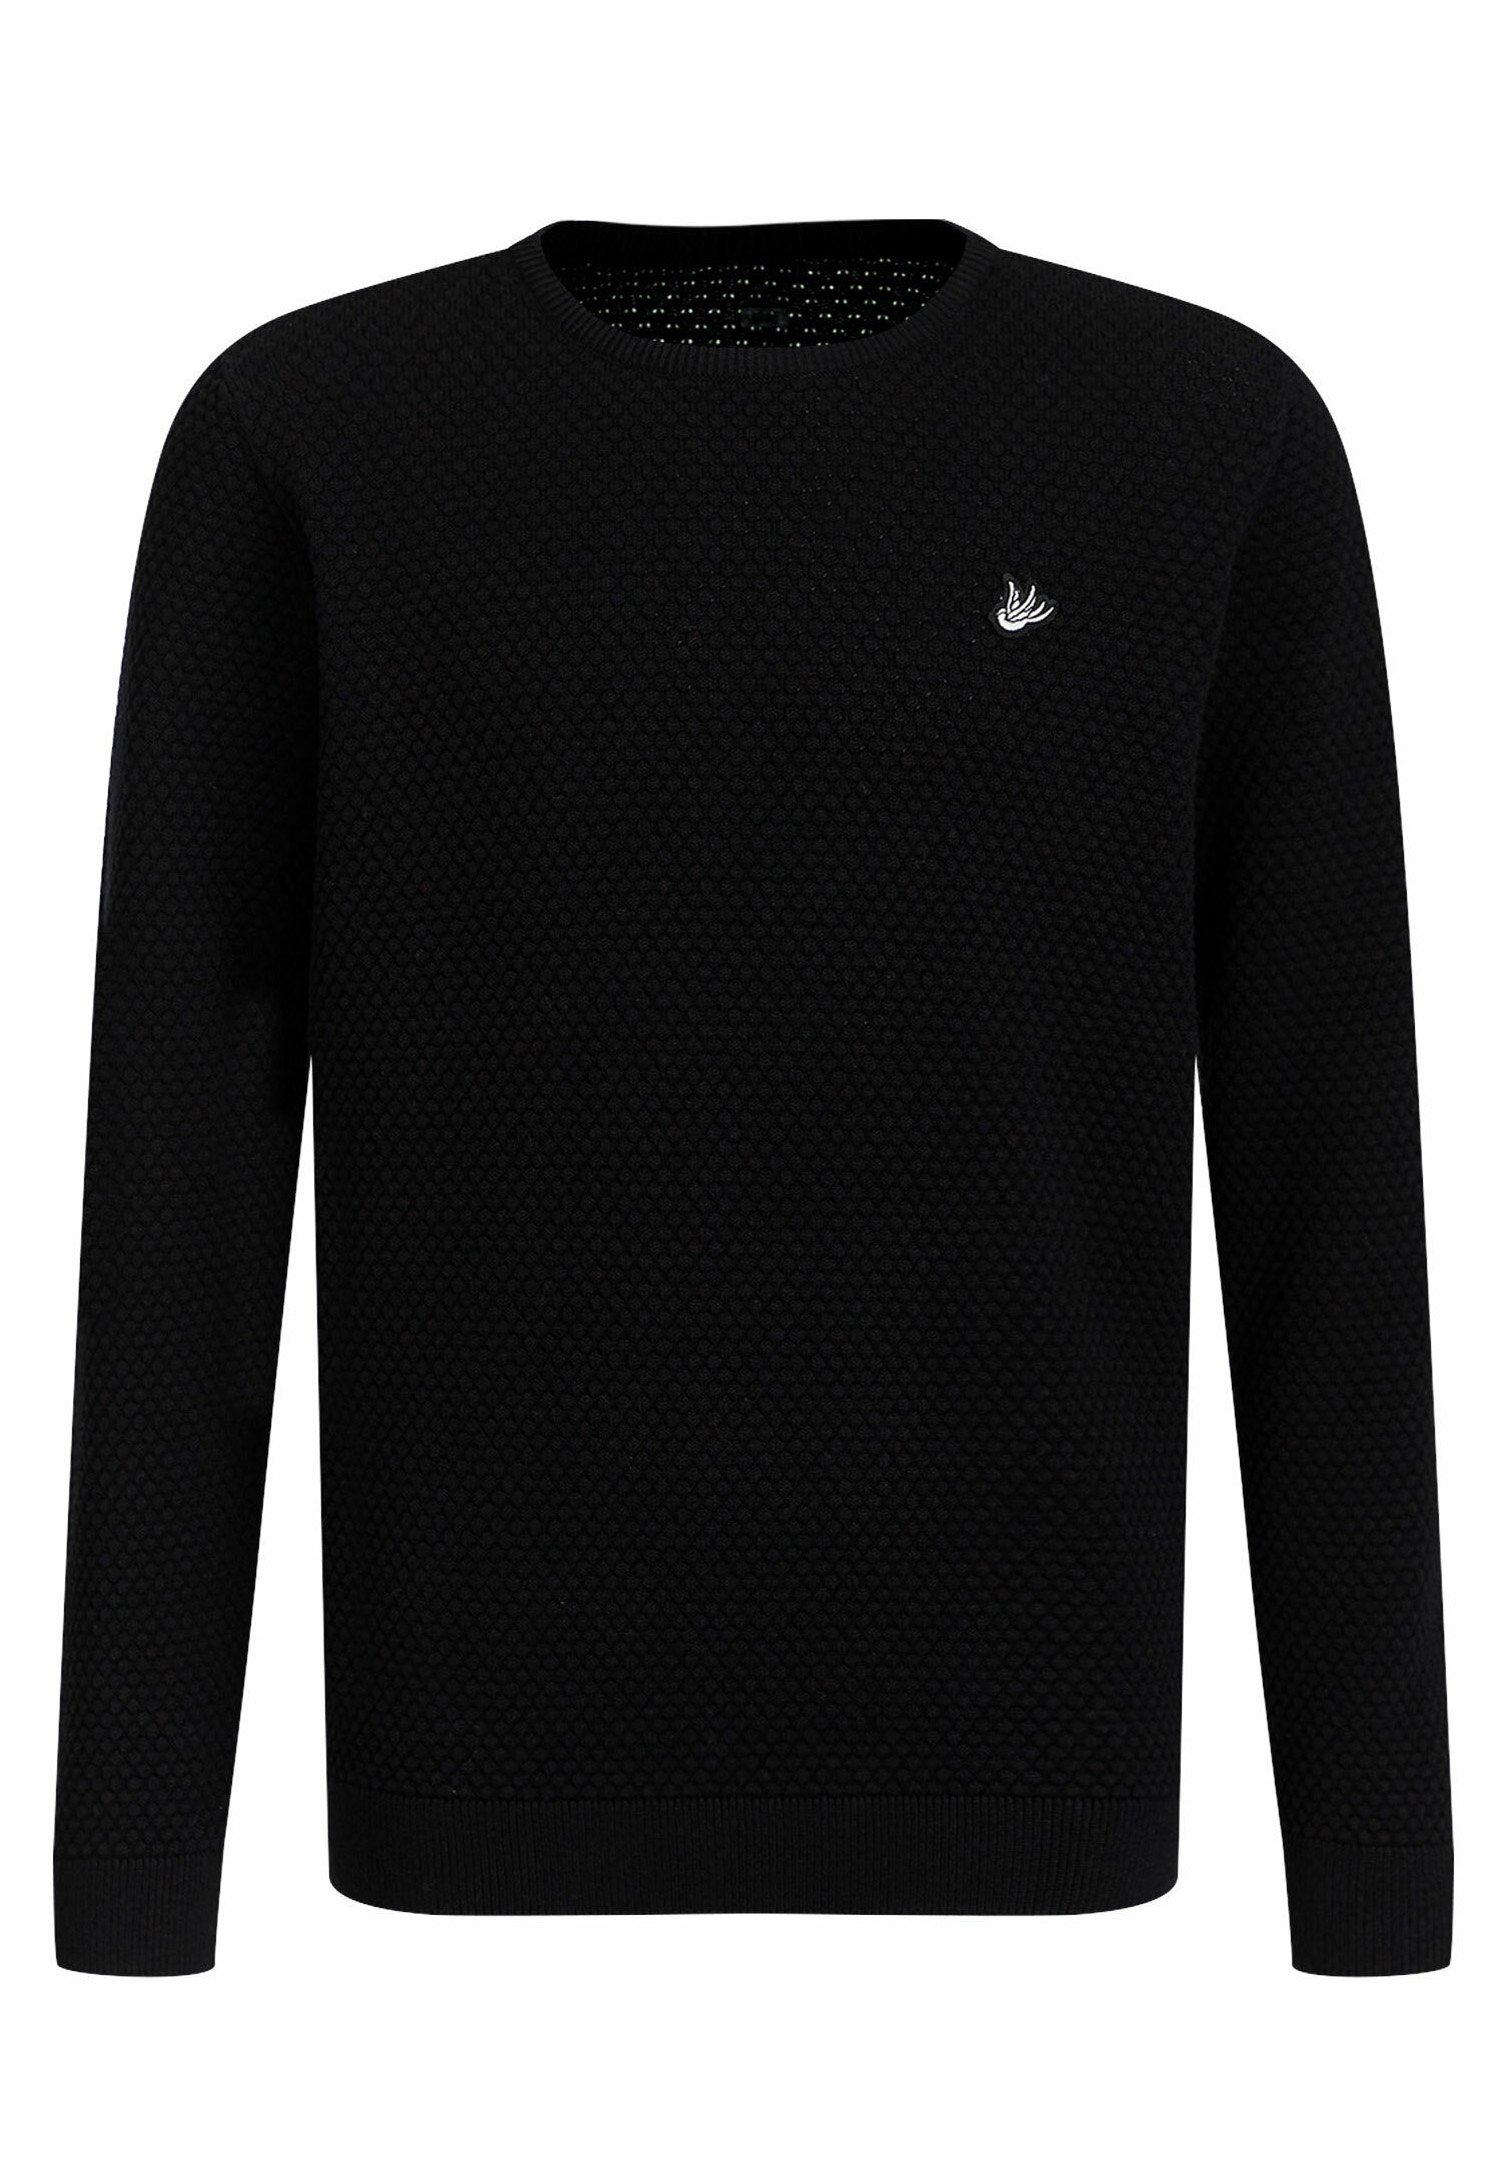 Jongens fijn gebreide trui | 94867763 WE Fashion